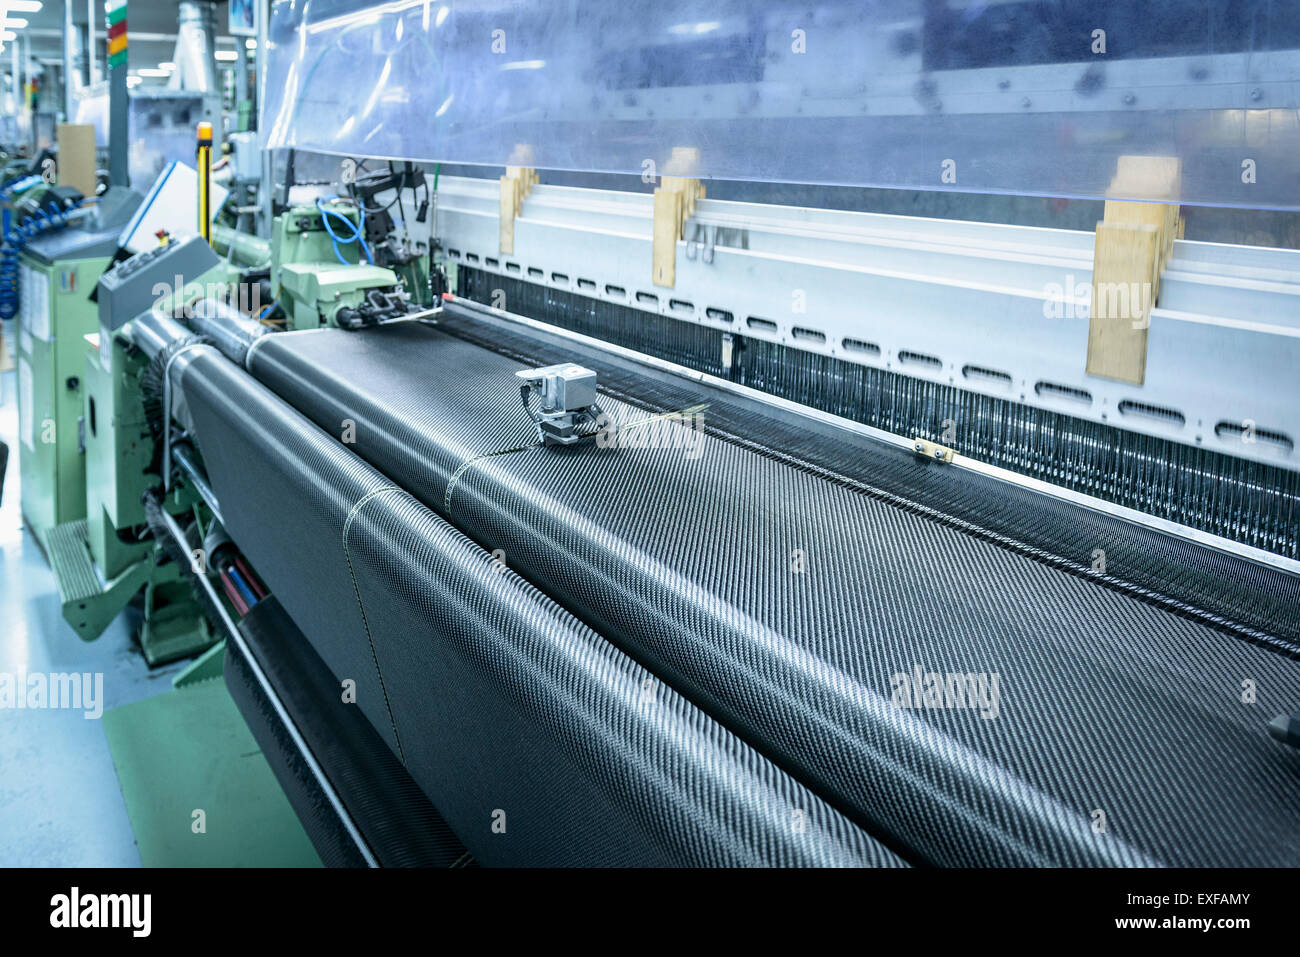 Carbon fibre loom in detail in carbon fibre factory - Stock Image